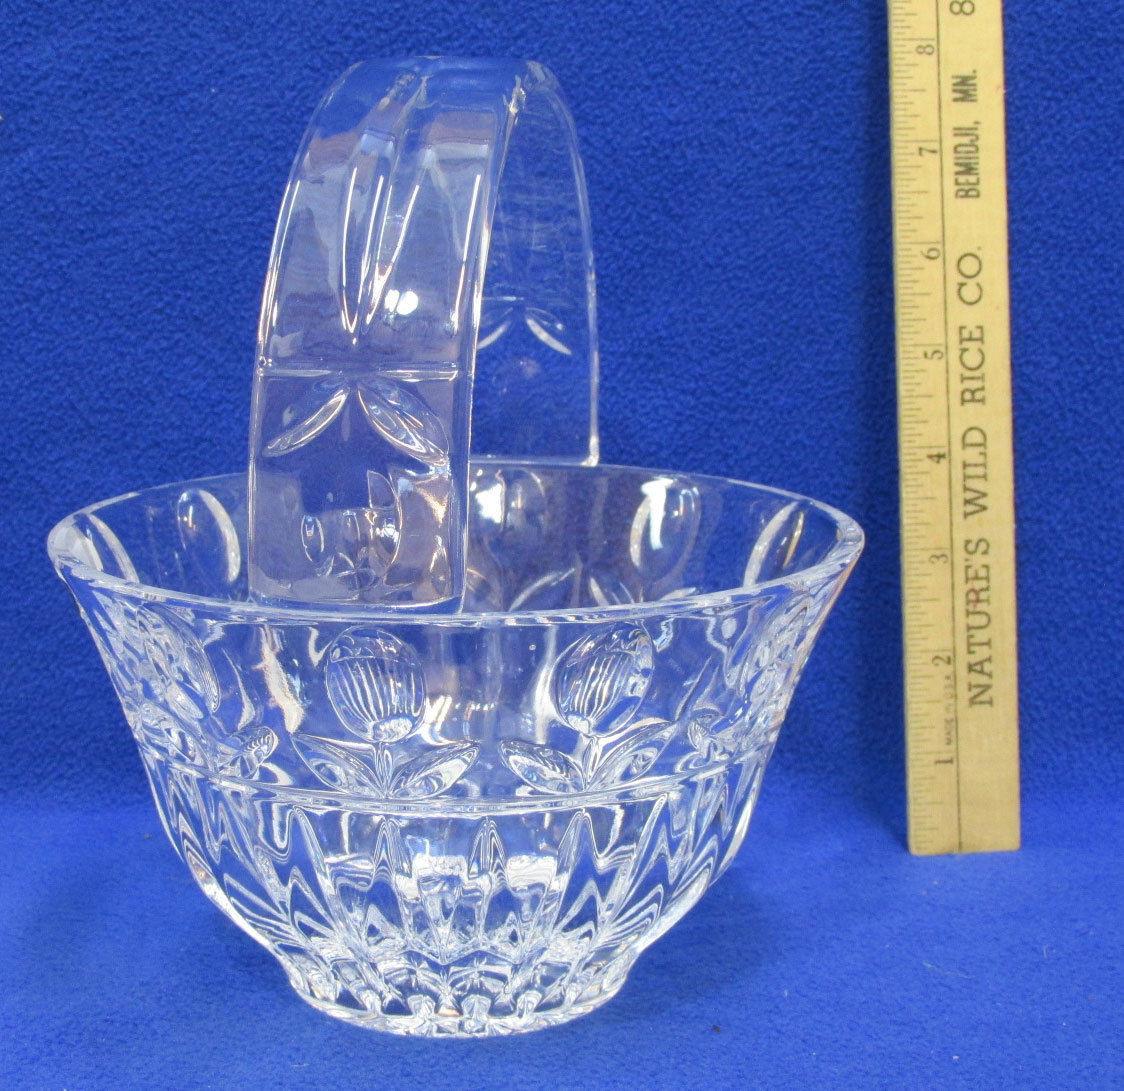 rcr crystal vase of block crystal tulip garden handled basket y3916 ebay inside s l1600